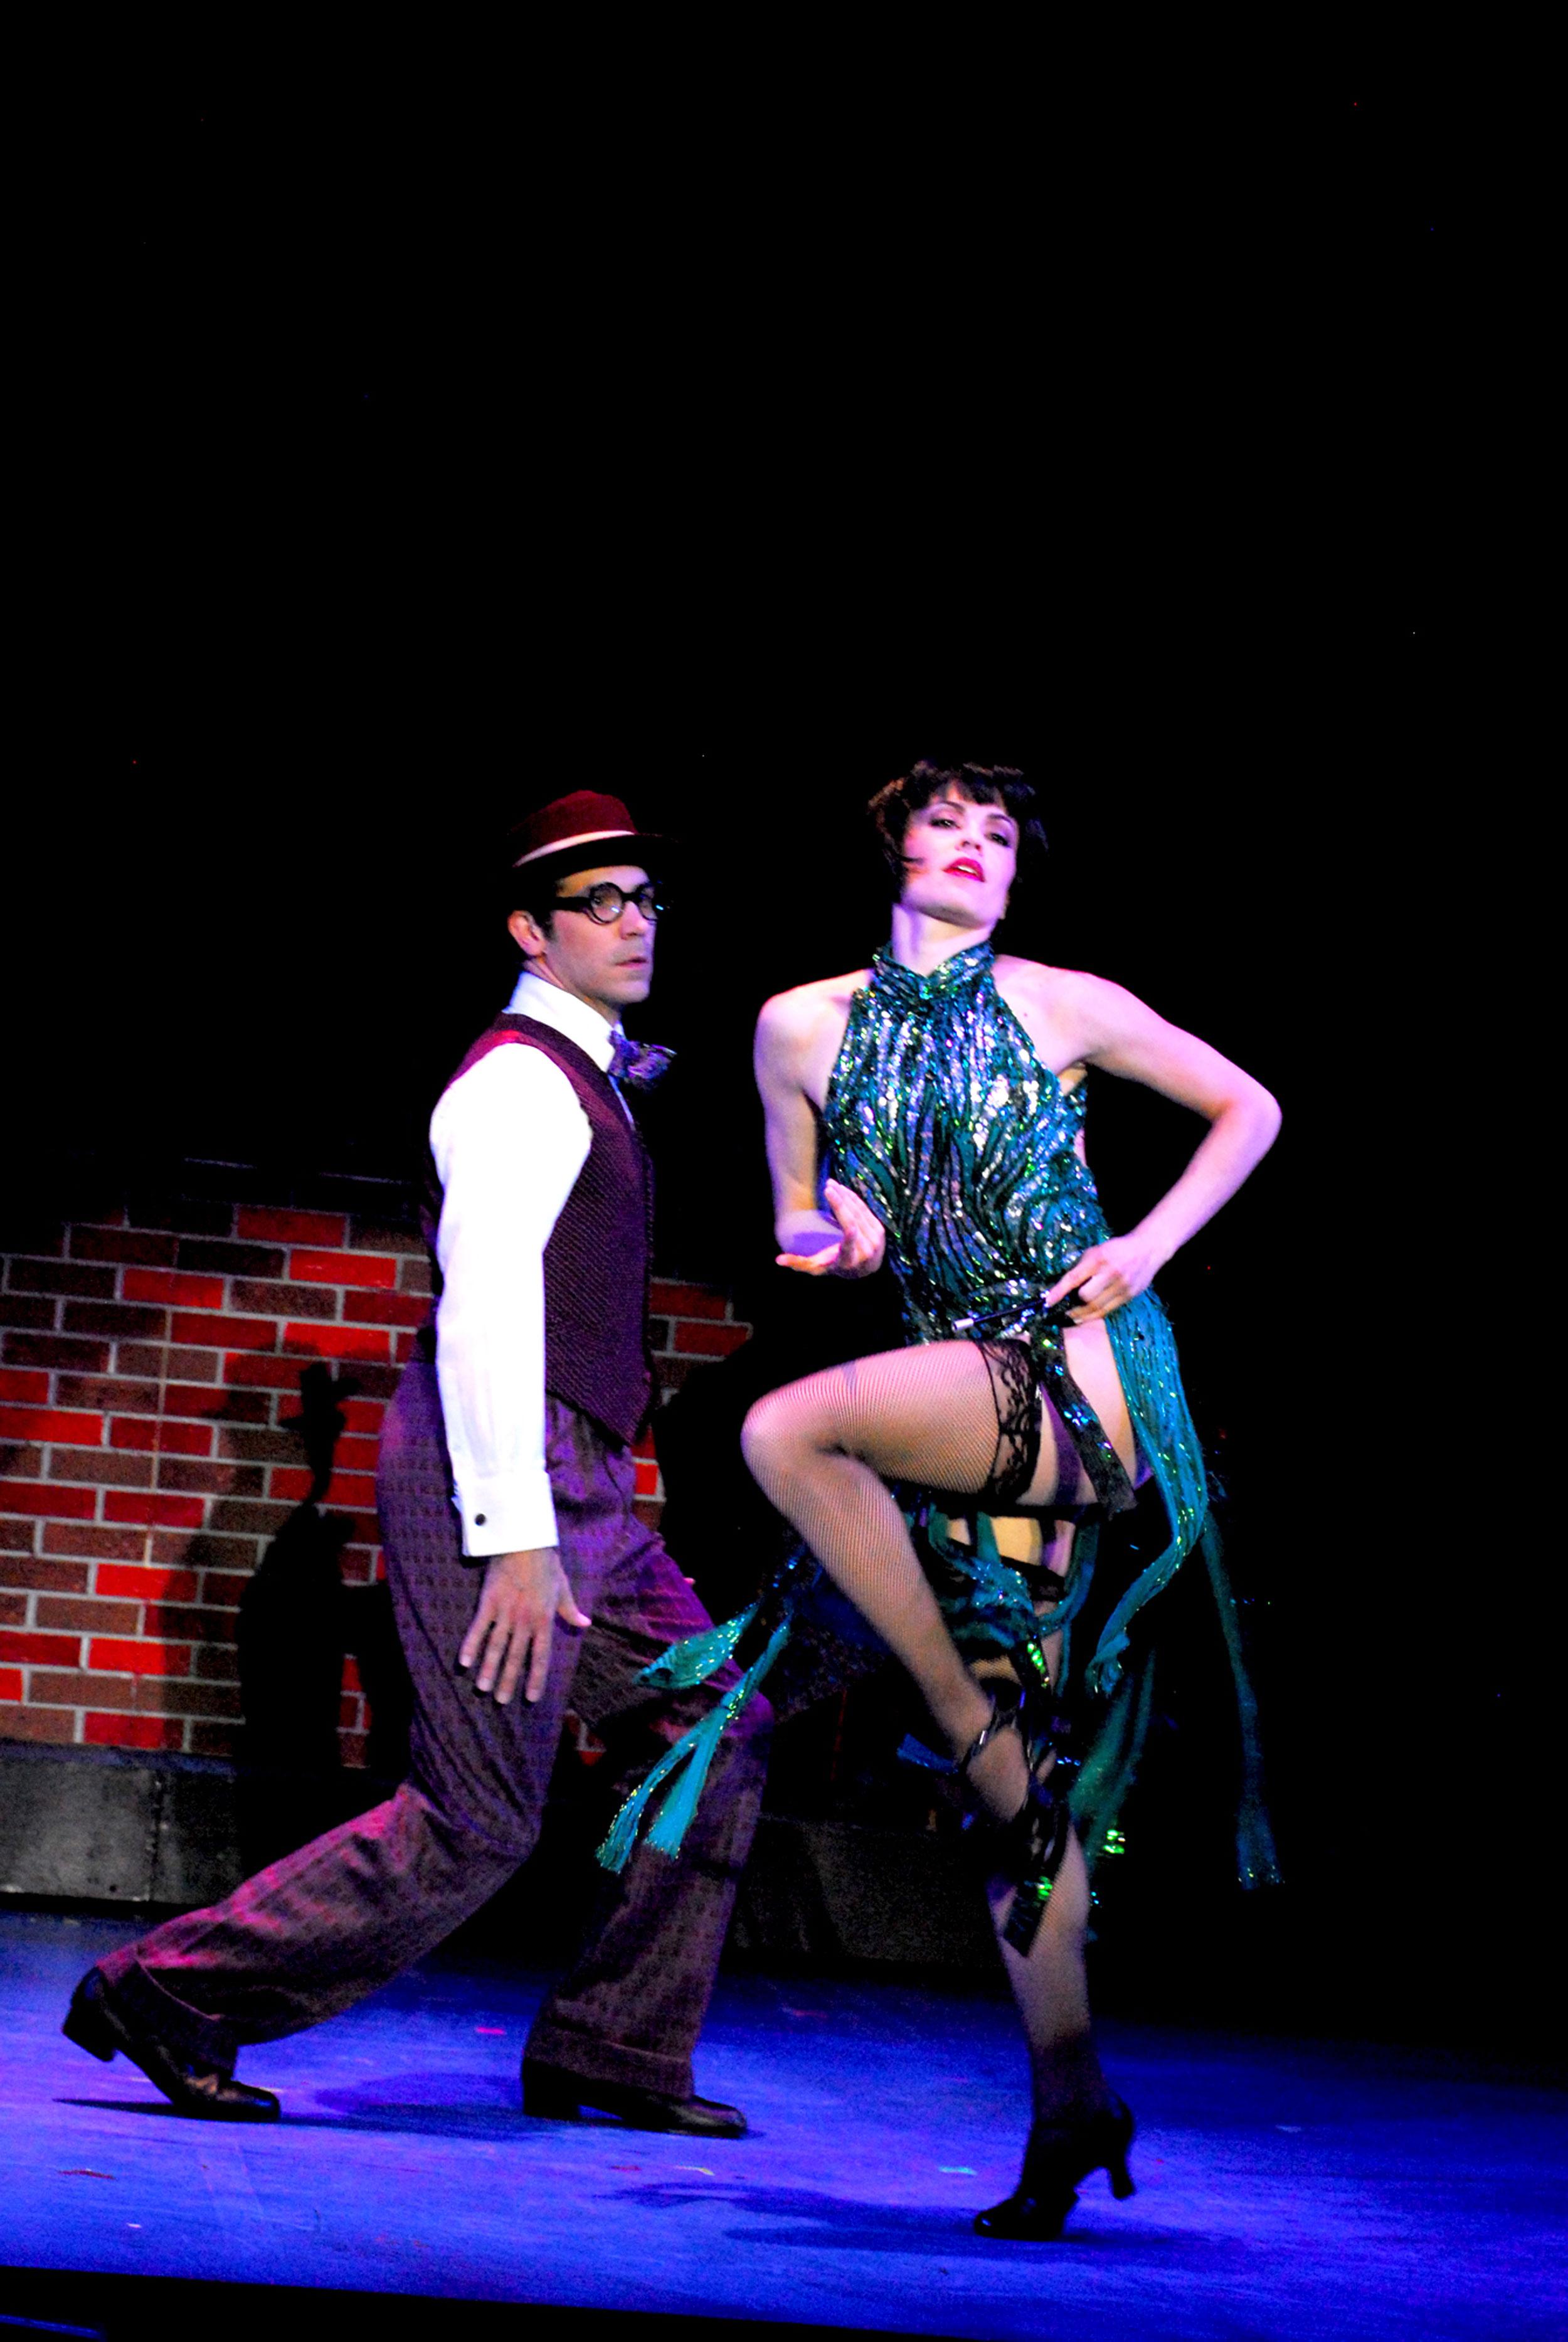 2009_SITR_Joey-Sorge_Mahri-Relin_Broadway-Rhythm_photo-by-Gary-Ng.jpg